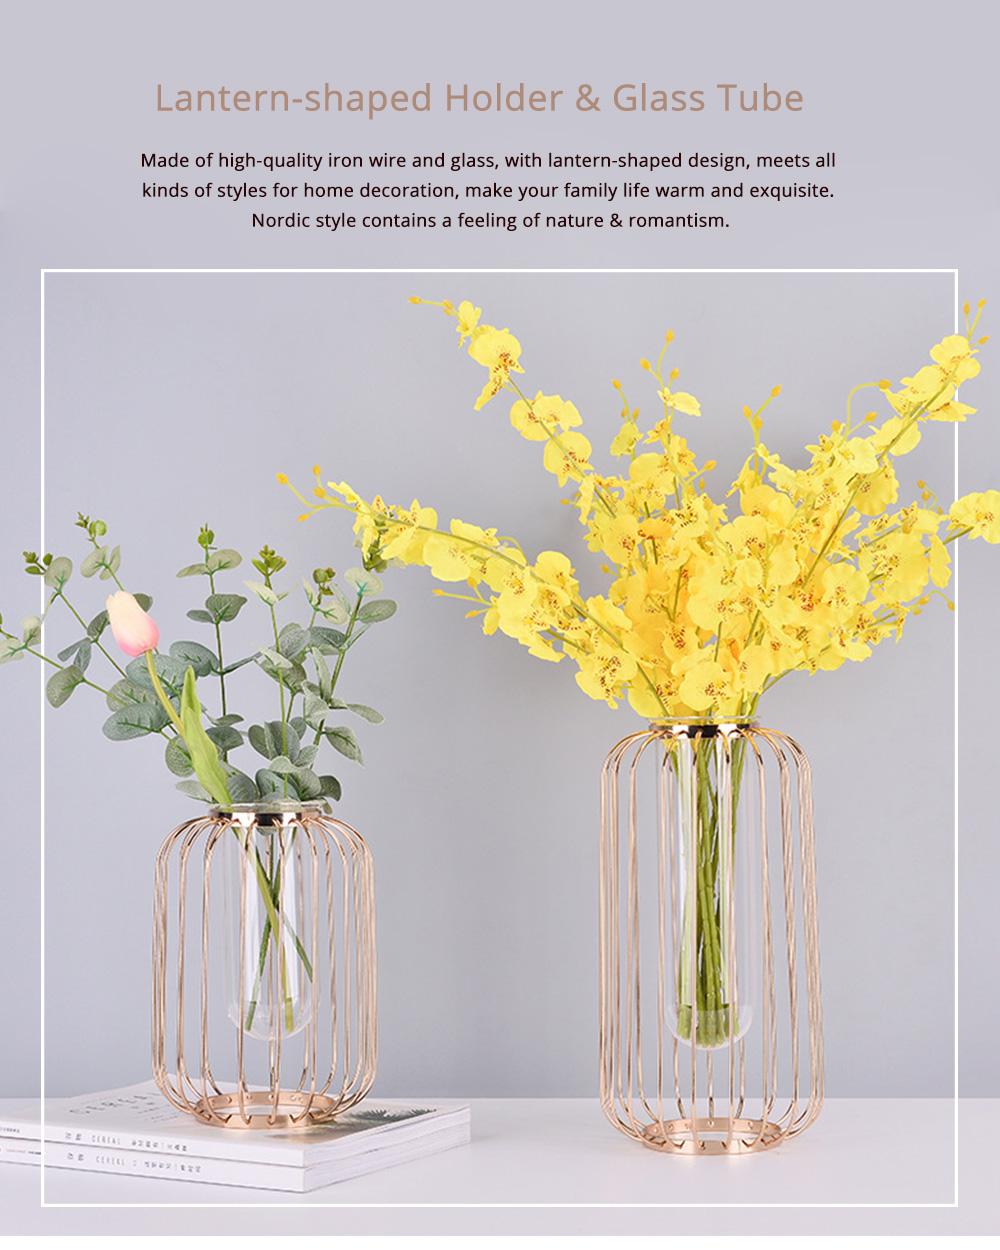 Luxury Nordic Style Vase with Wrought Iron Art, Lantern-shaped Holder with Glass Tube Inside 0